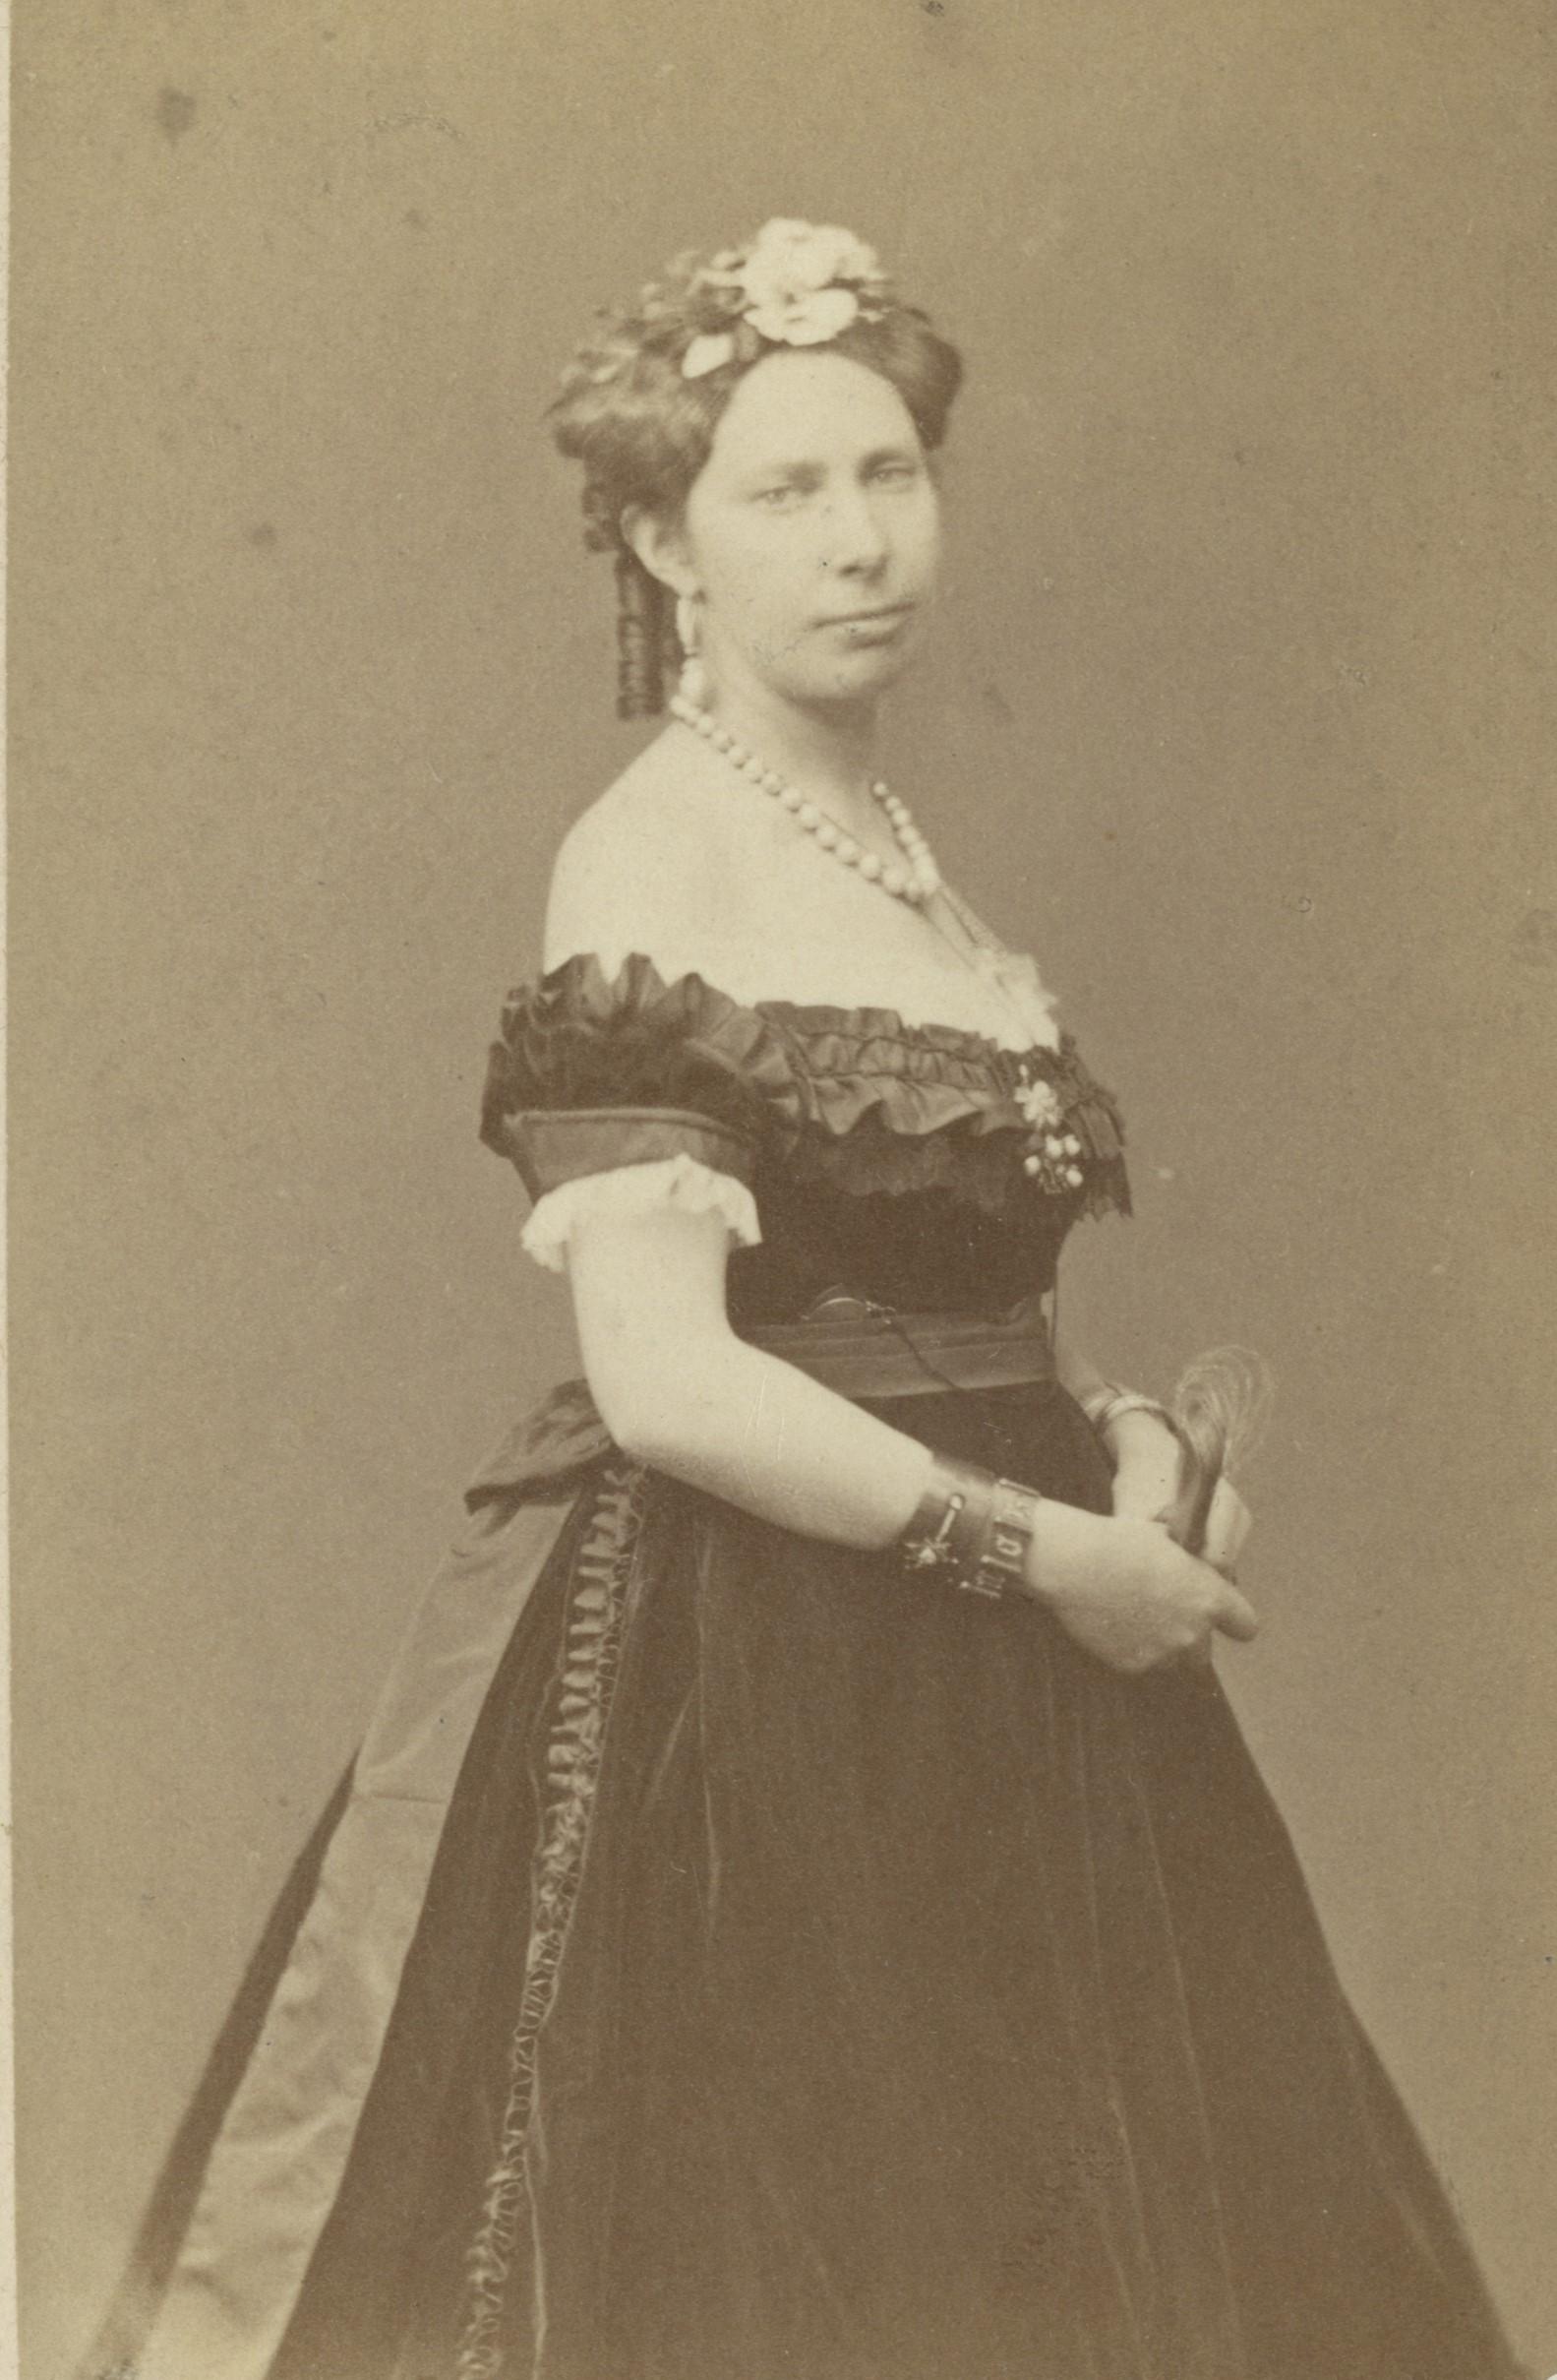 Queen Louise of Sweden and Norway, circa 1865-1871. Photo: Bertha Valerius (1824-1895). Armémuseum, AMA.0002231